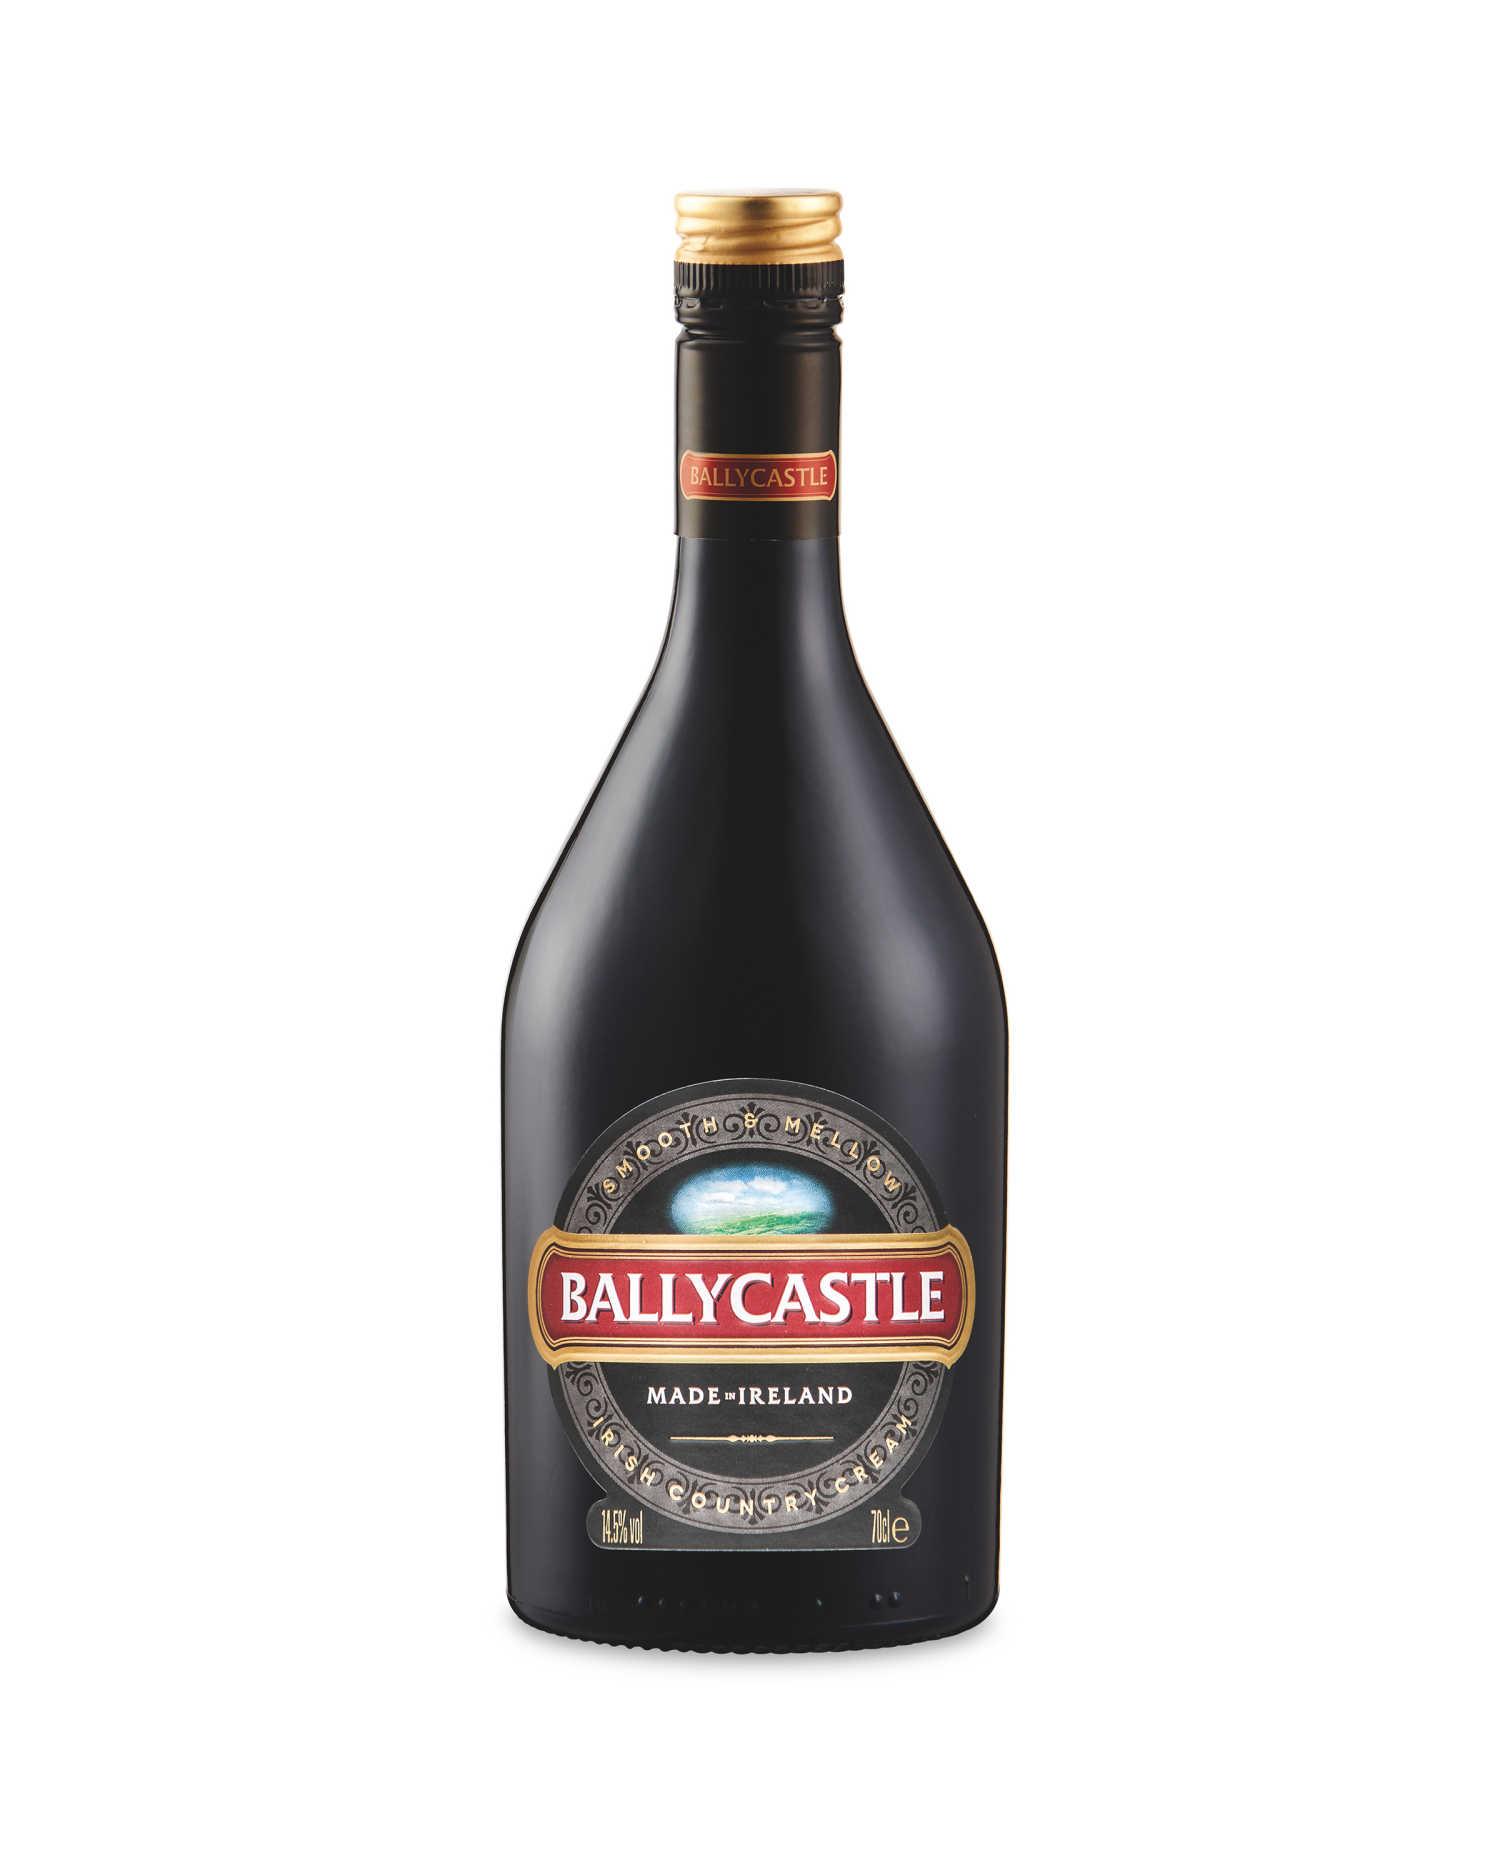 Ballycastle Aldi